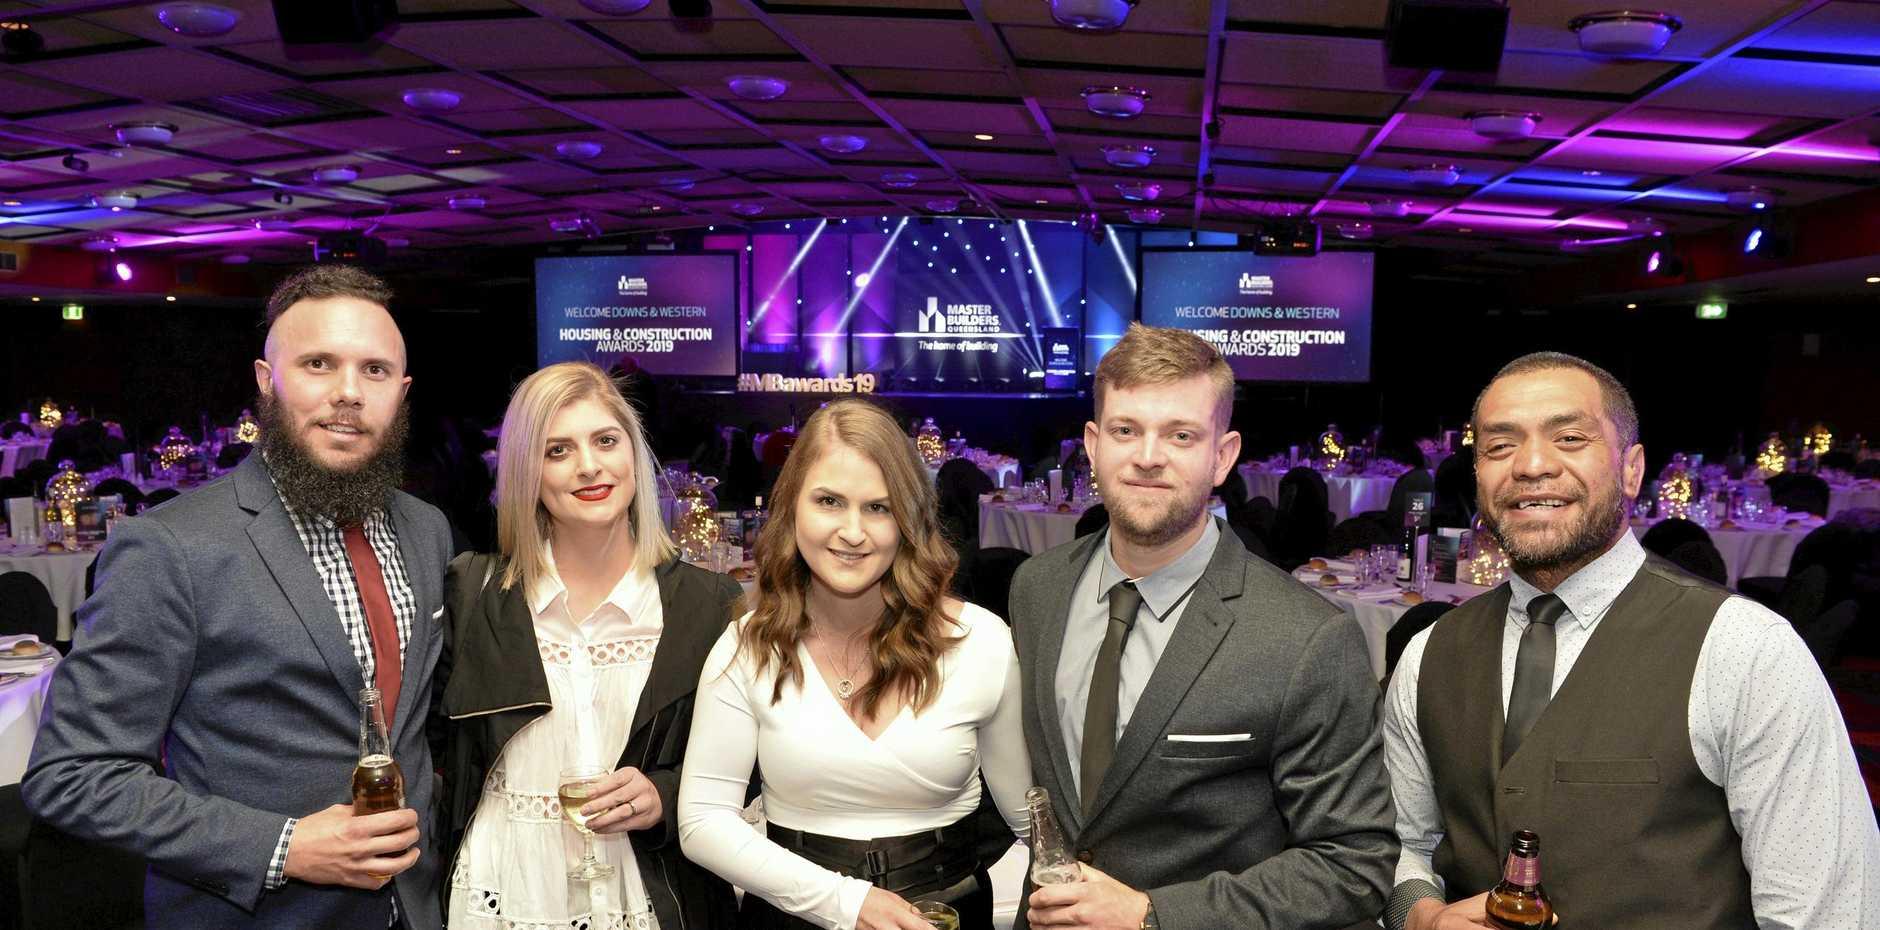 Representing Northbuild are (from left) Jared Davidson, Samantha Davidson, Rebecca Beadman, Karl Bambosek and Eli Kanuta.